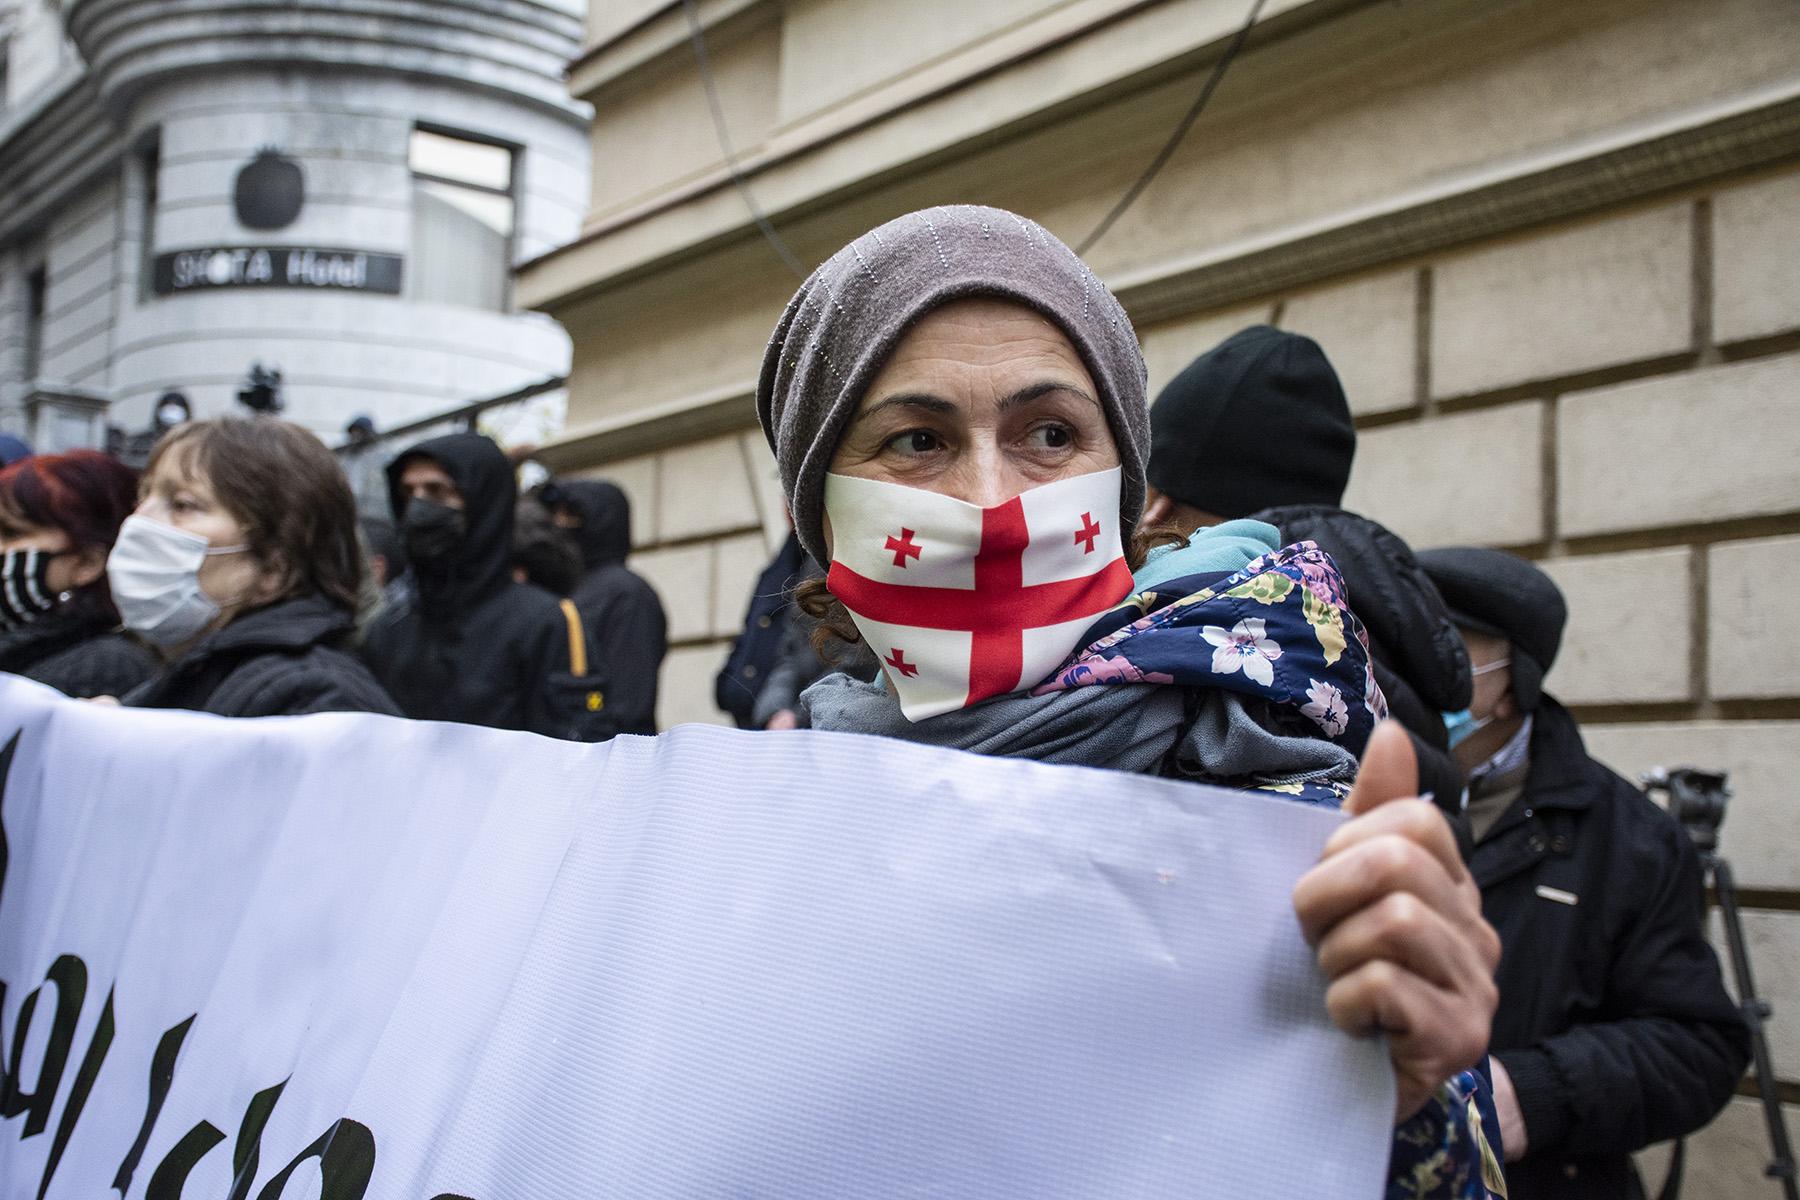 Protester outside of Georgia's Parliament. Photo: Mariam Nikuradze/OC Media.